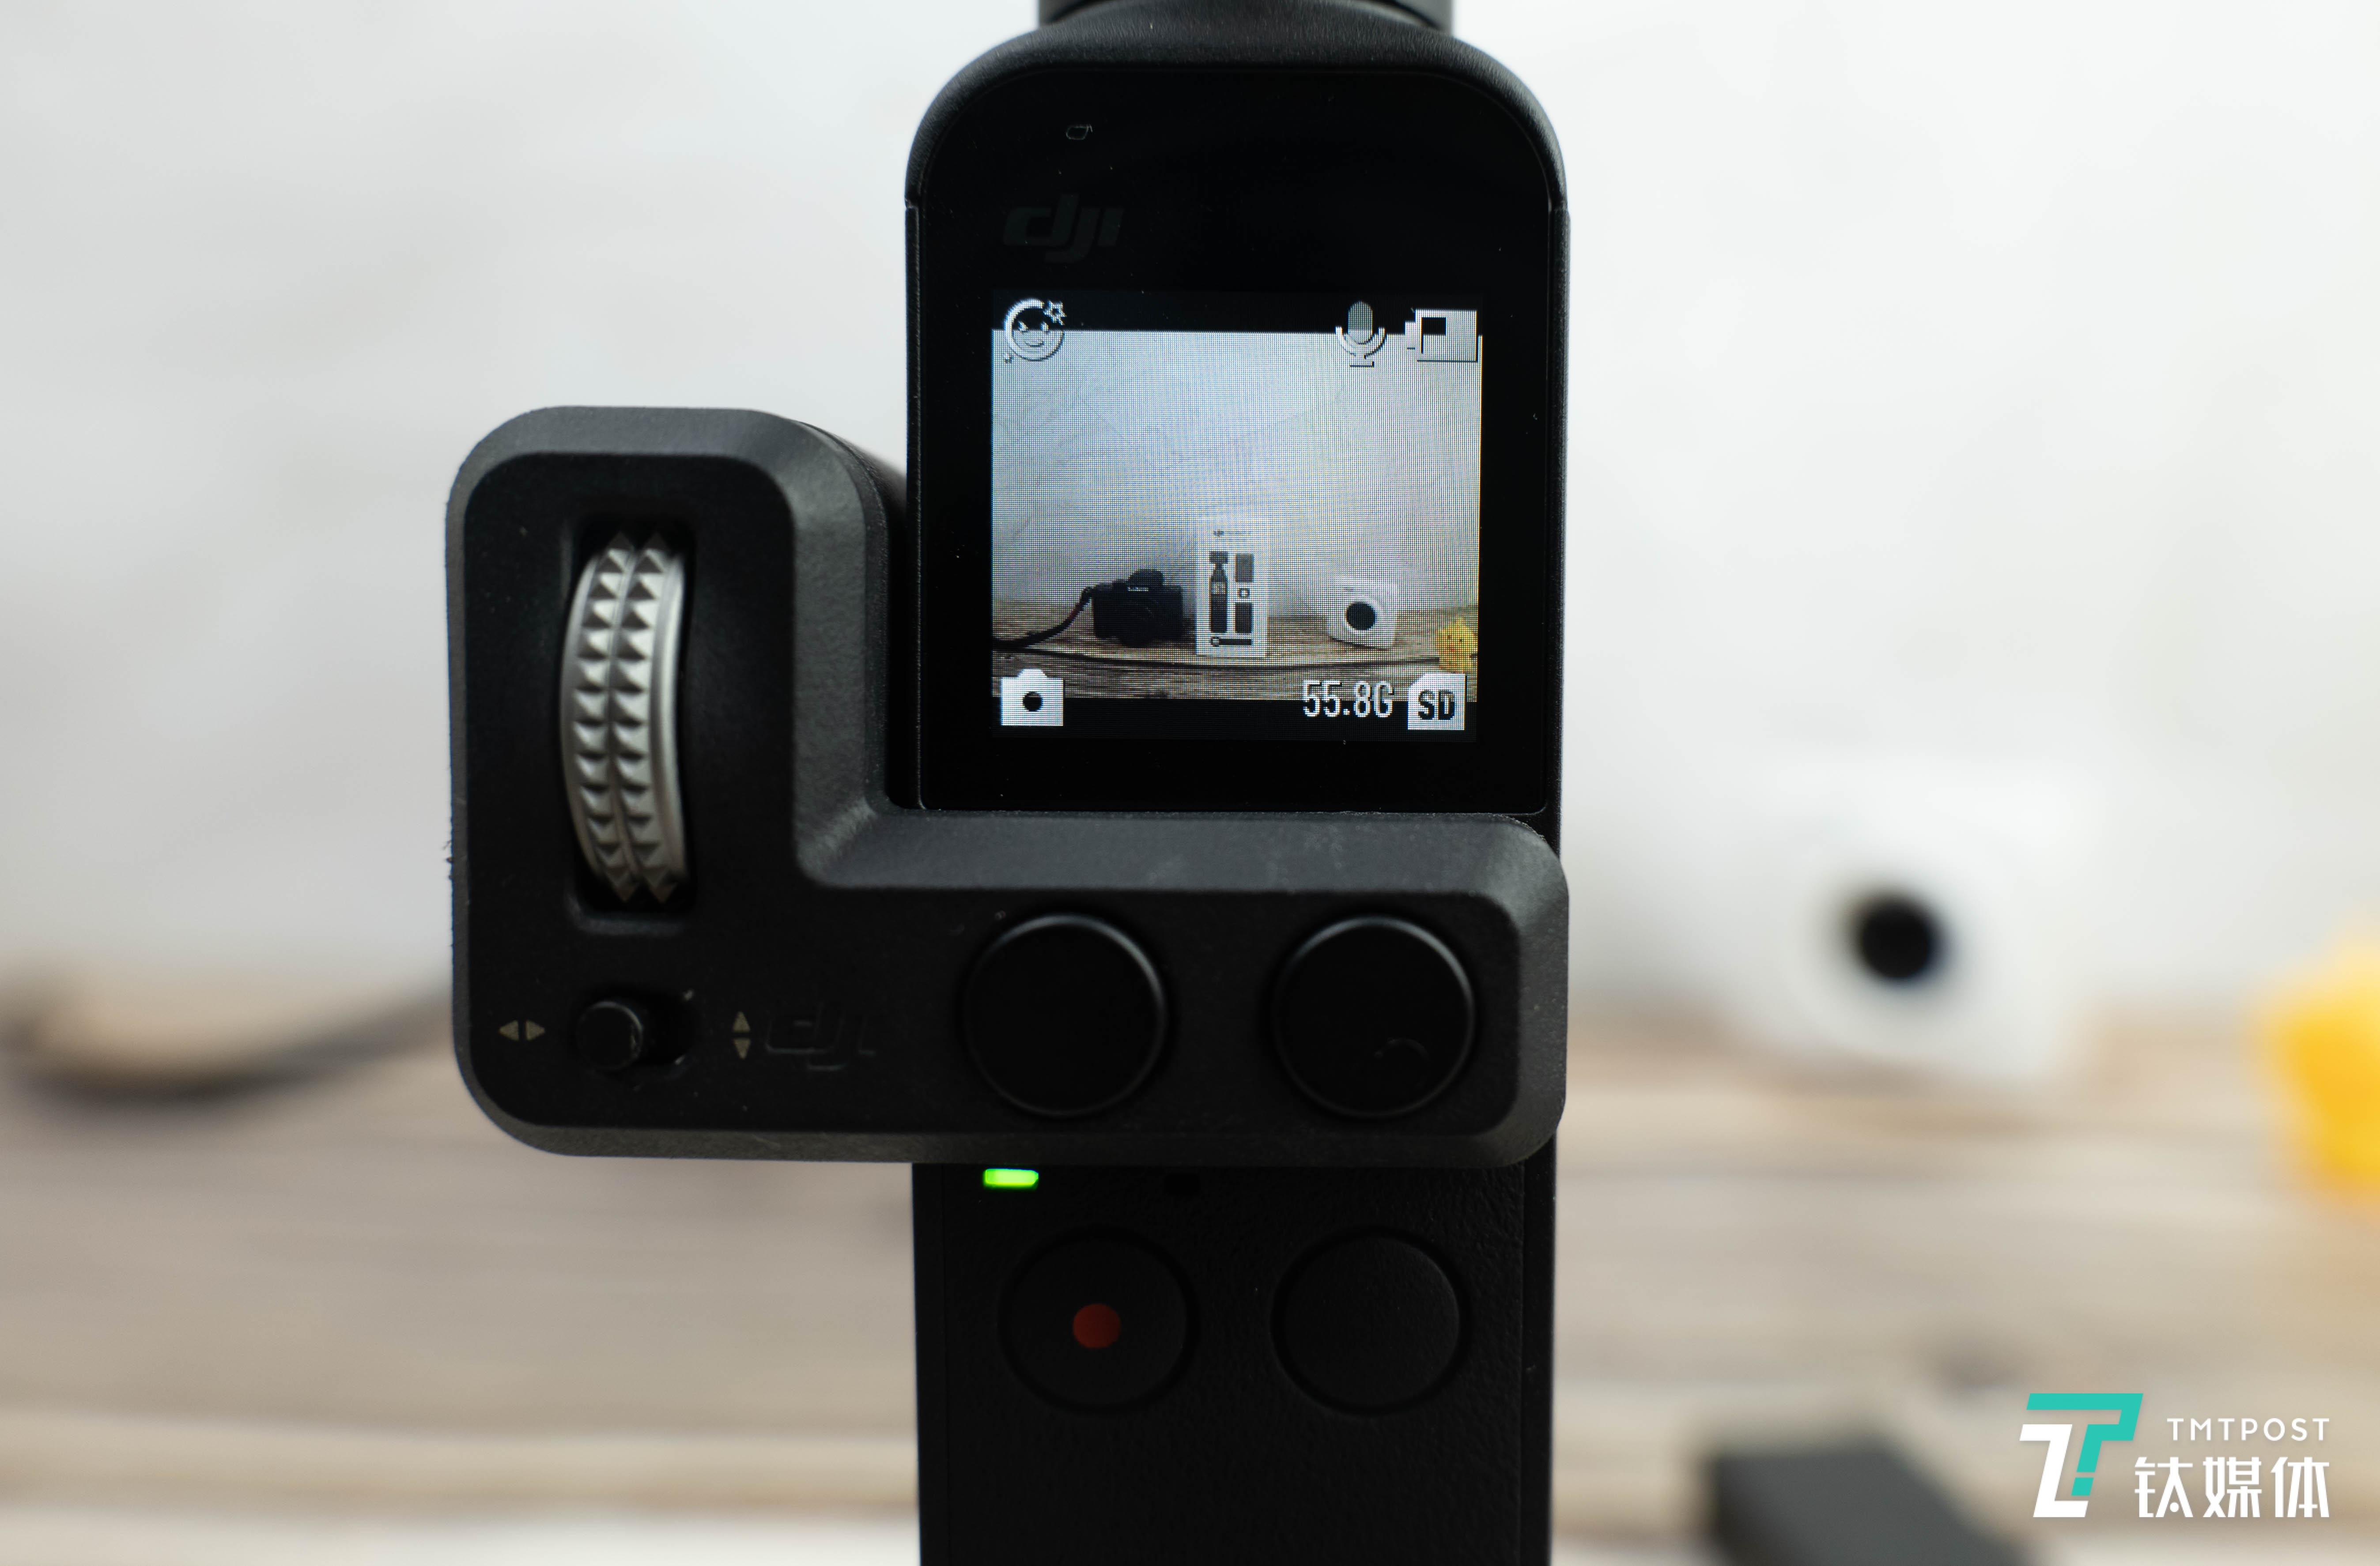 Pocket 2安装增广镜(注意画面边缘的小黄鸭)